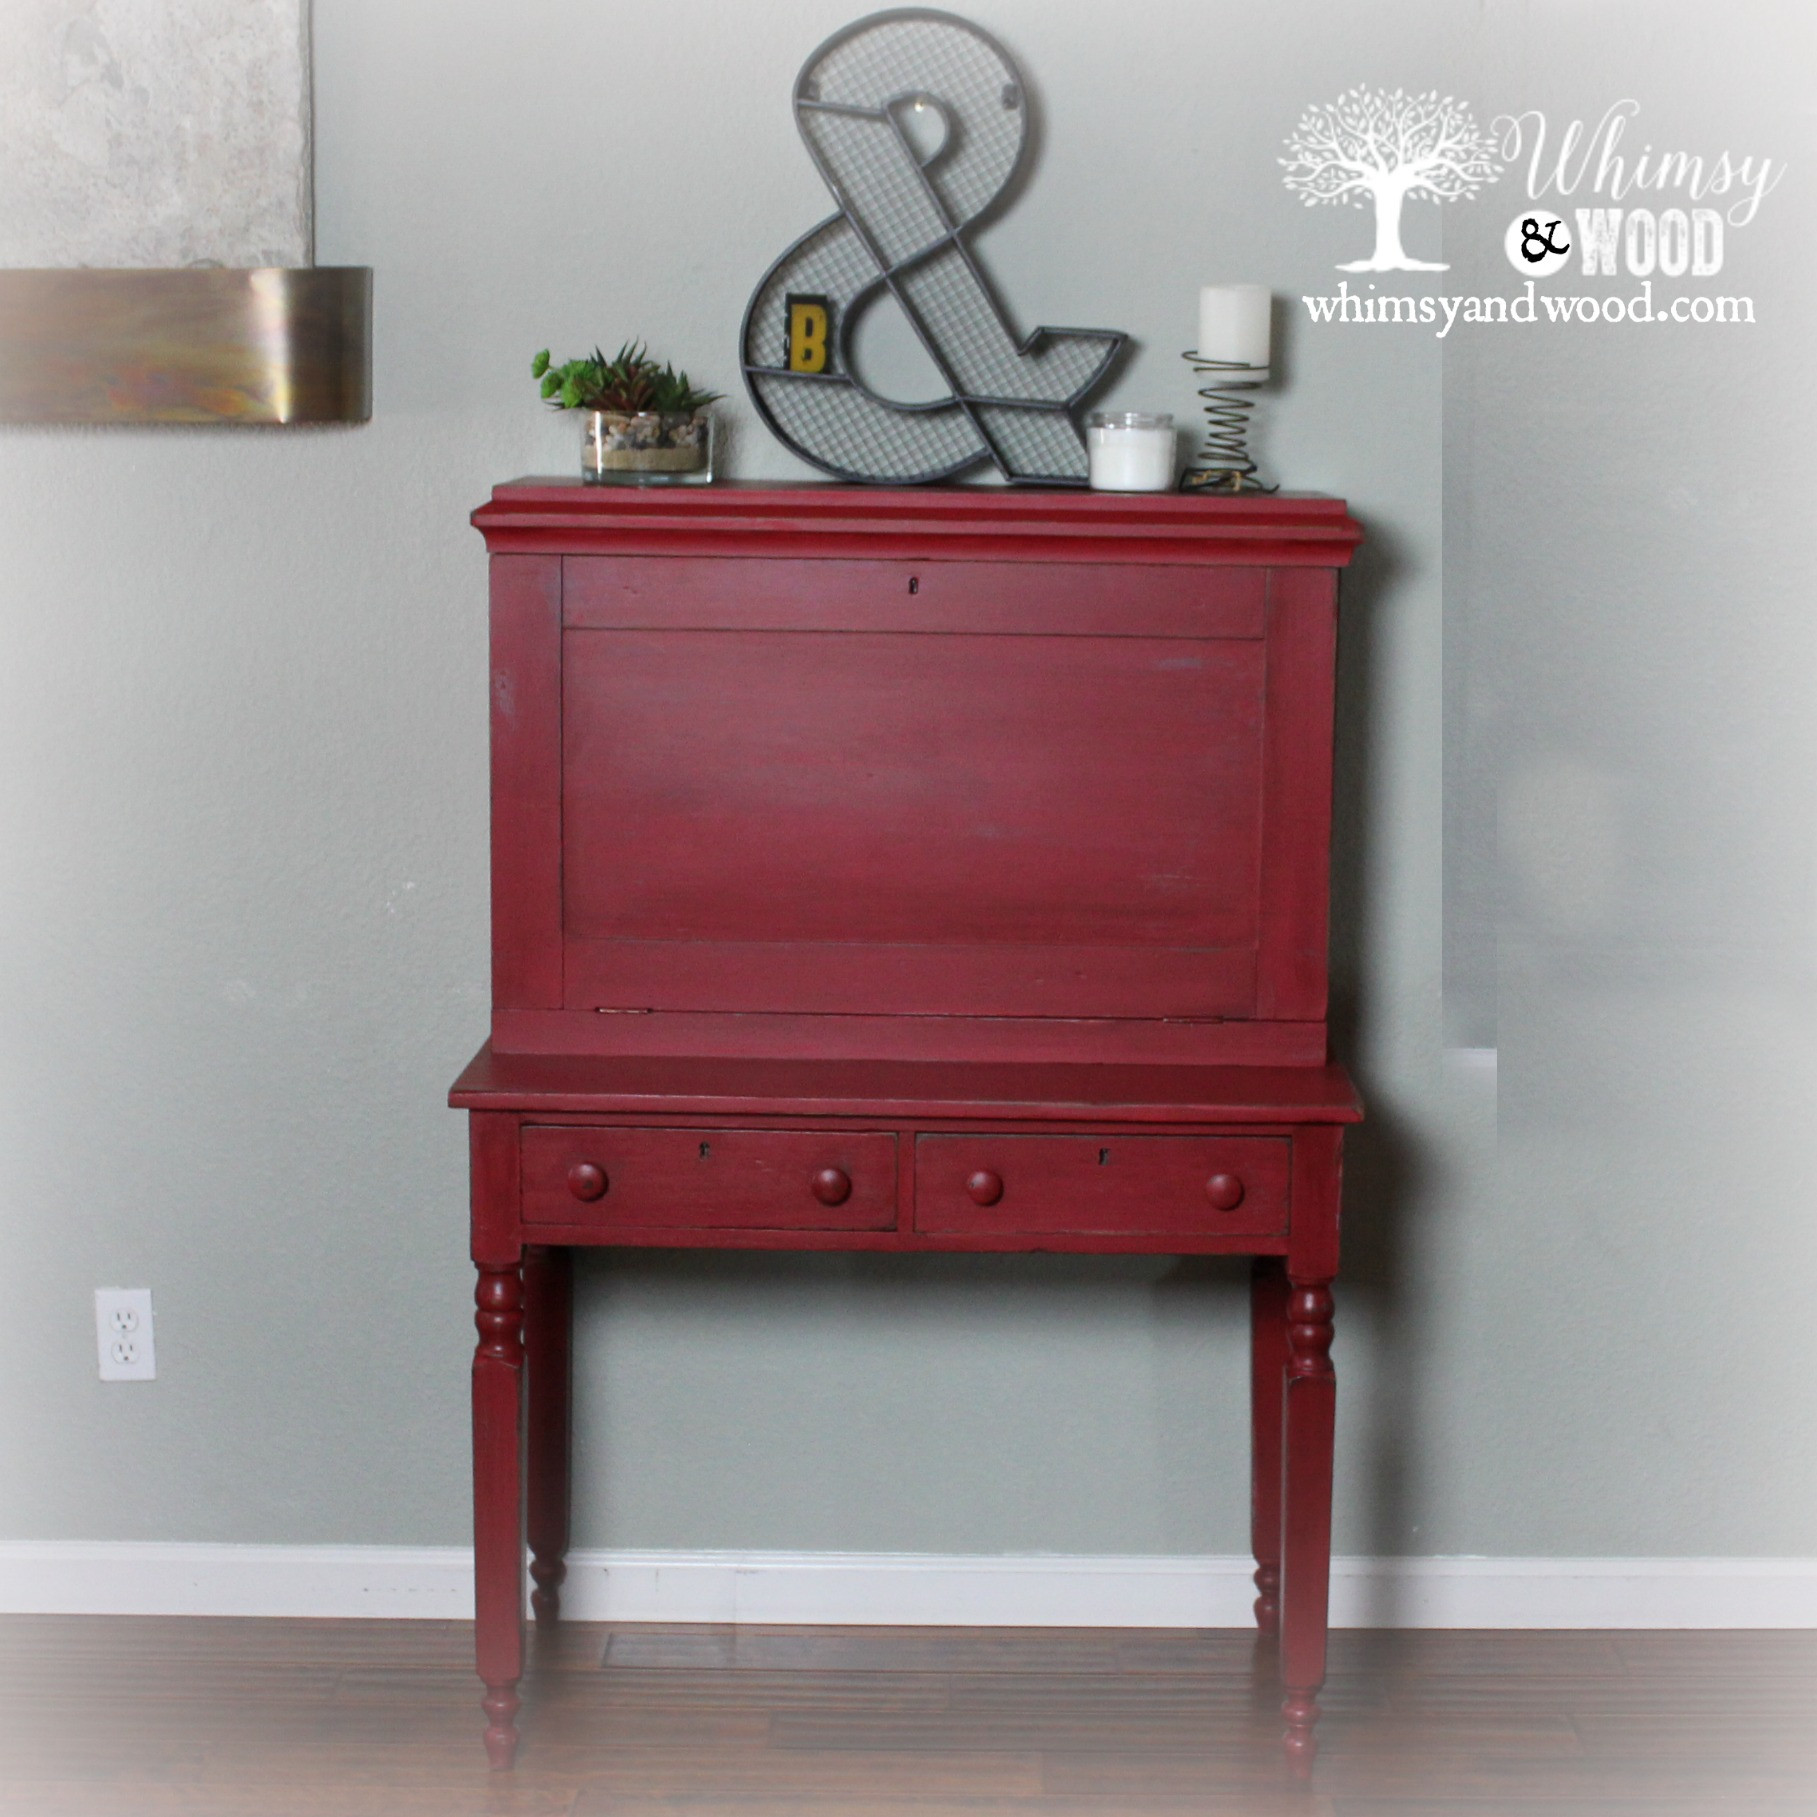 Drop down desk hinge hostgarcia for Build your own wall mounted desk